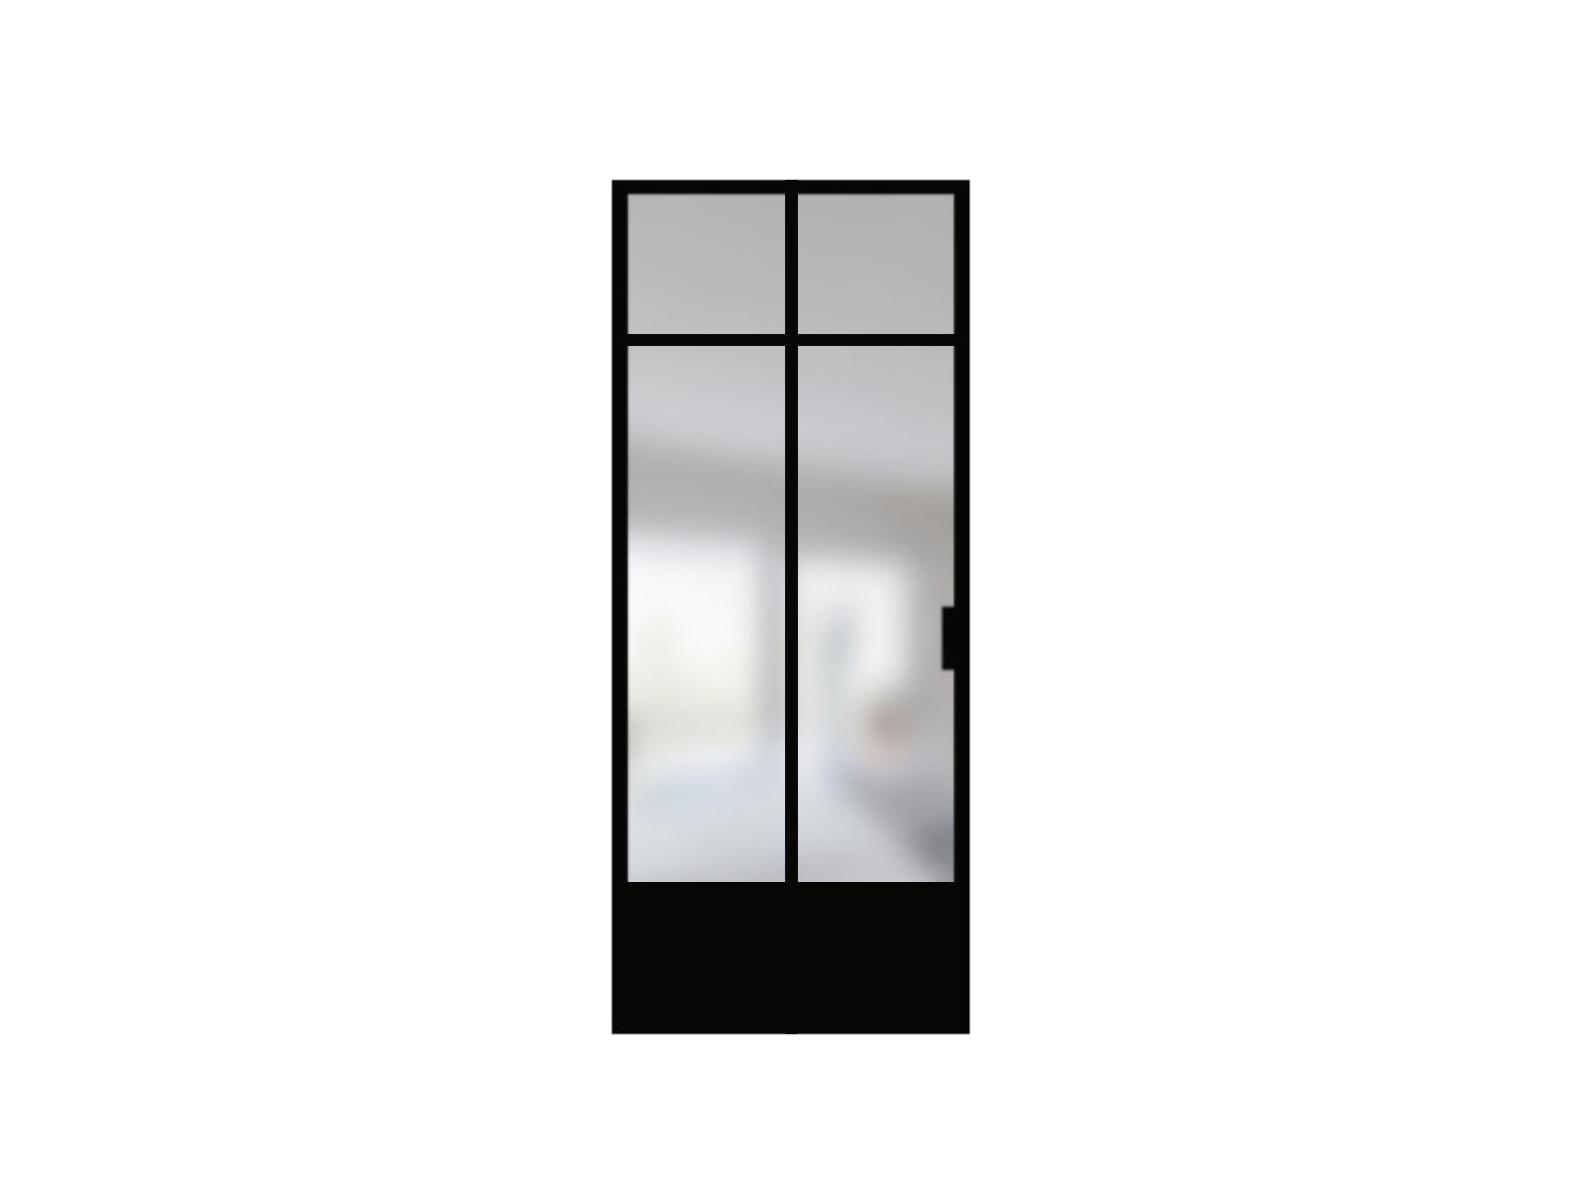 Bloc porte verrière style loft / ARTMETA